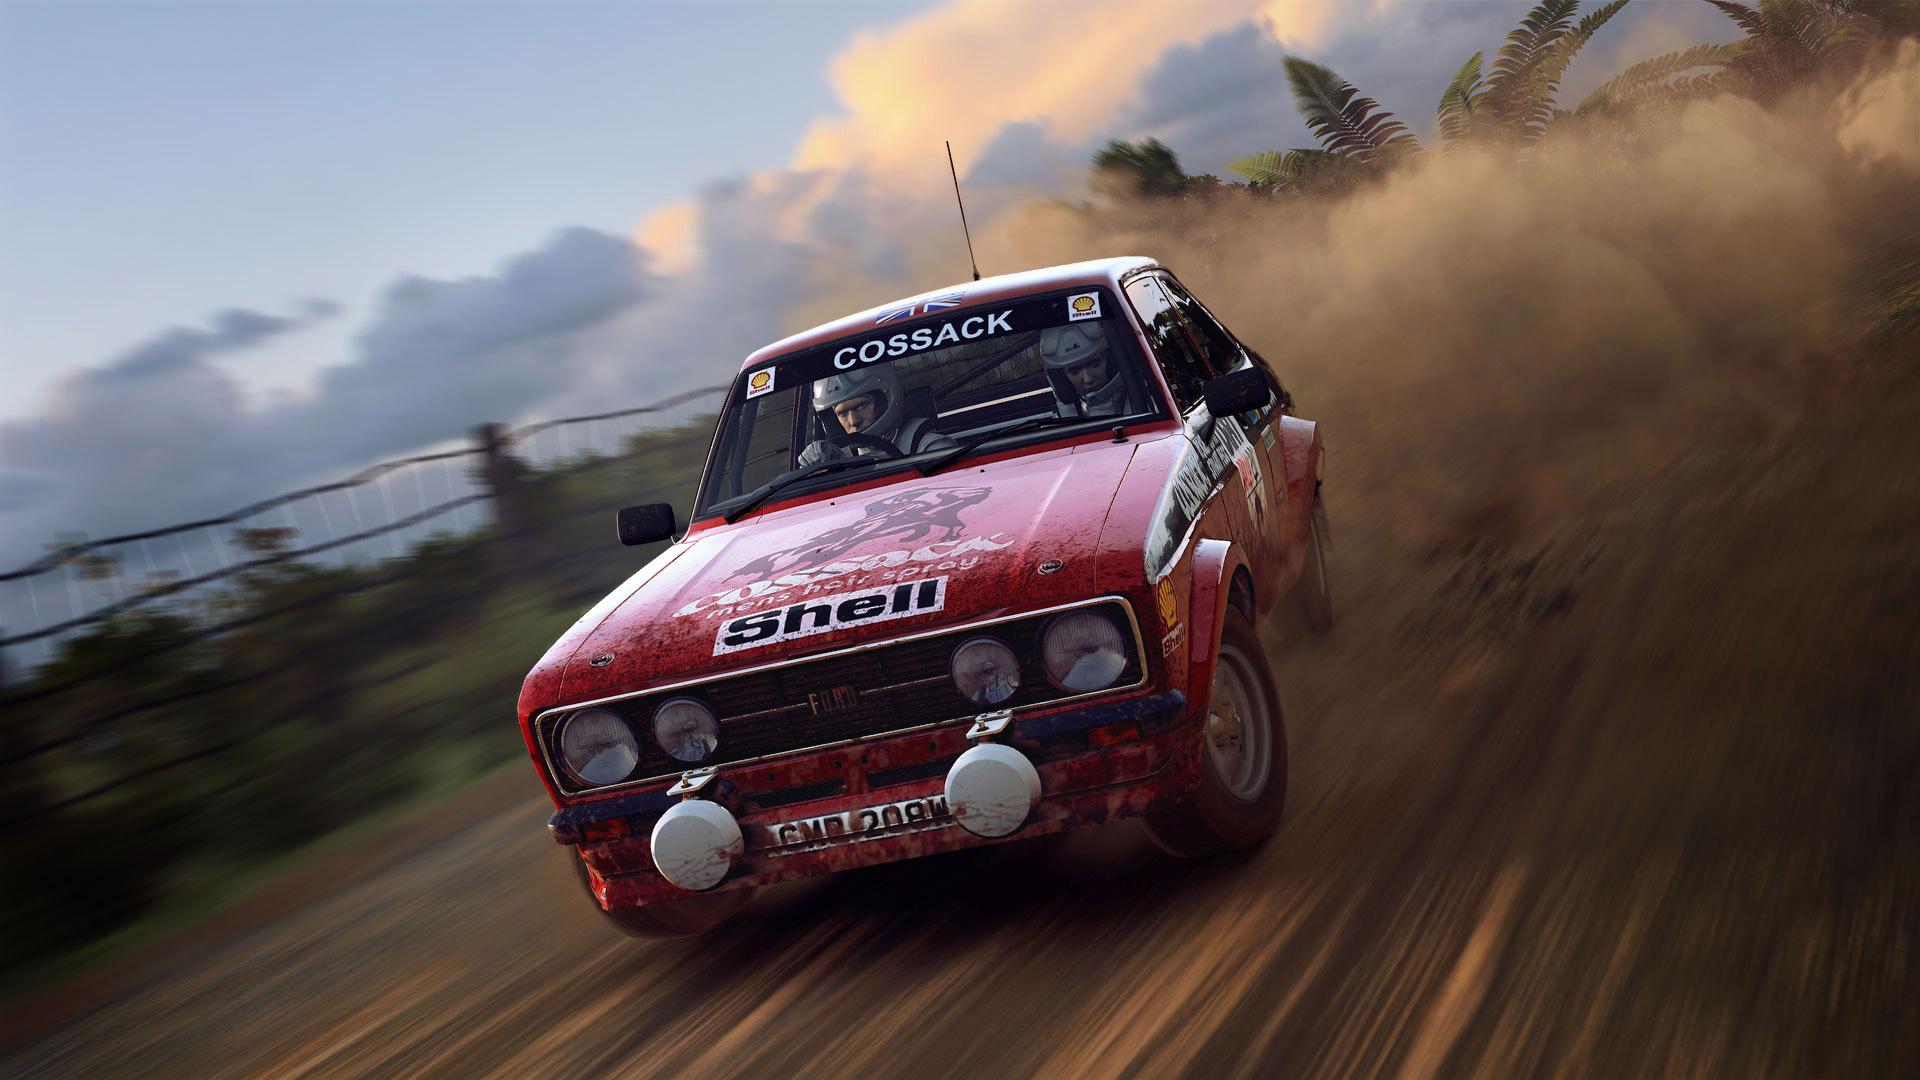 Dirt Rally 2.0 Wallpaper in 1920x1080